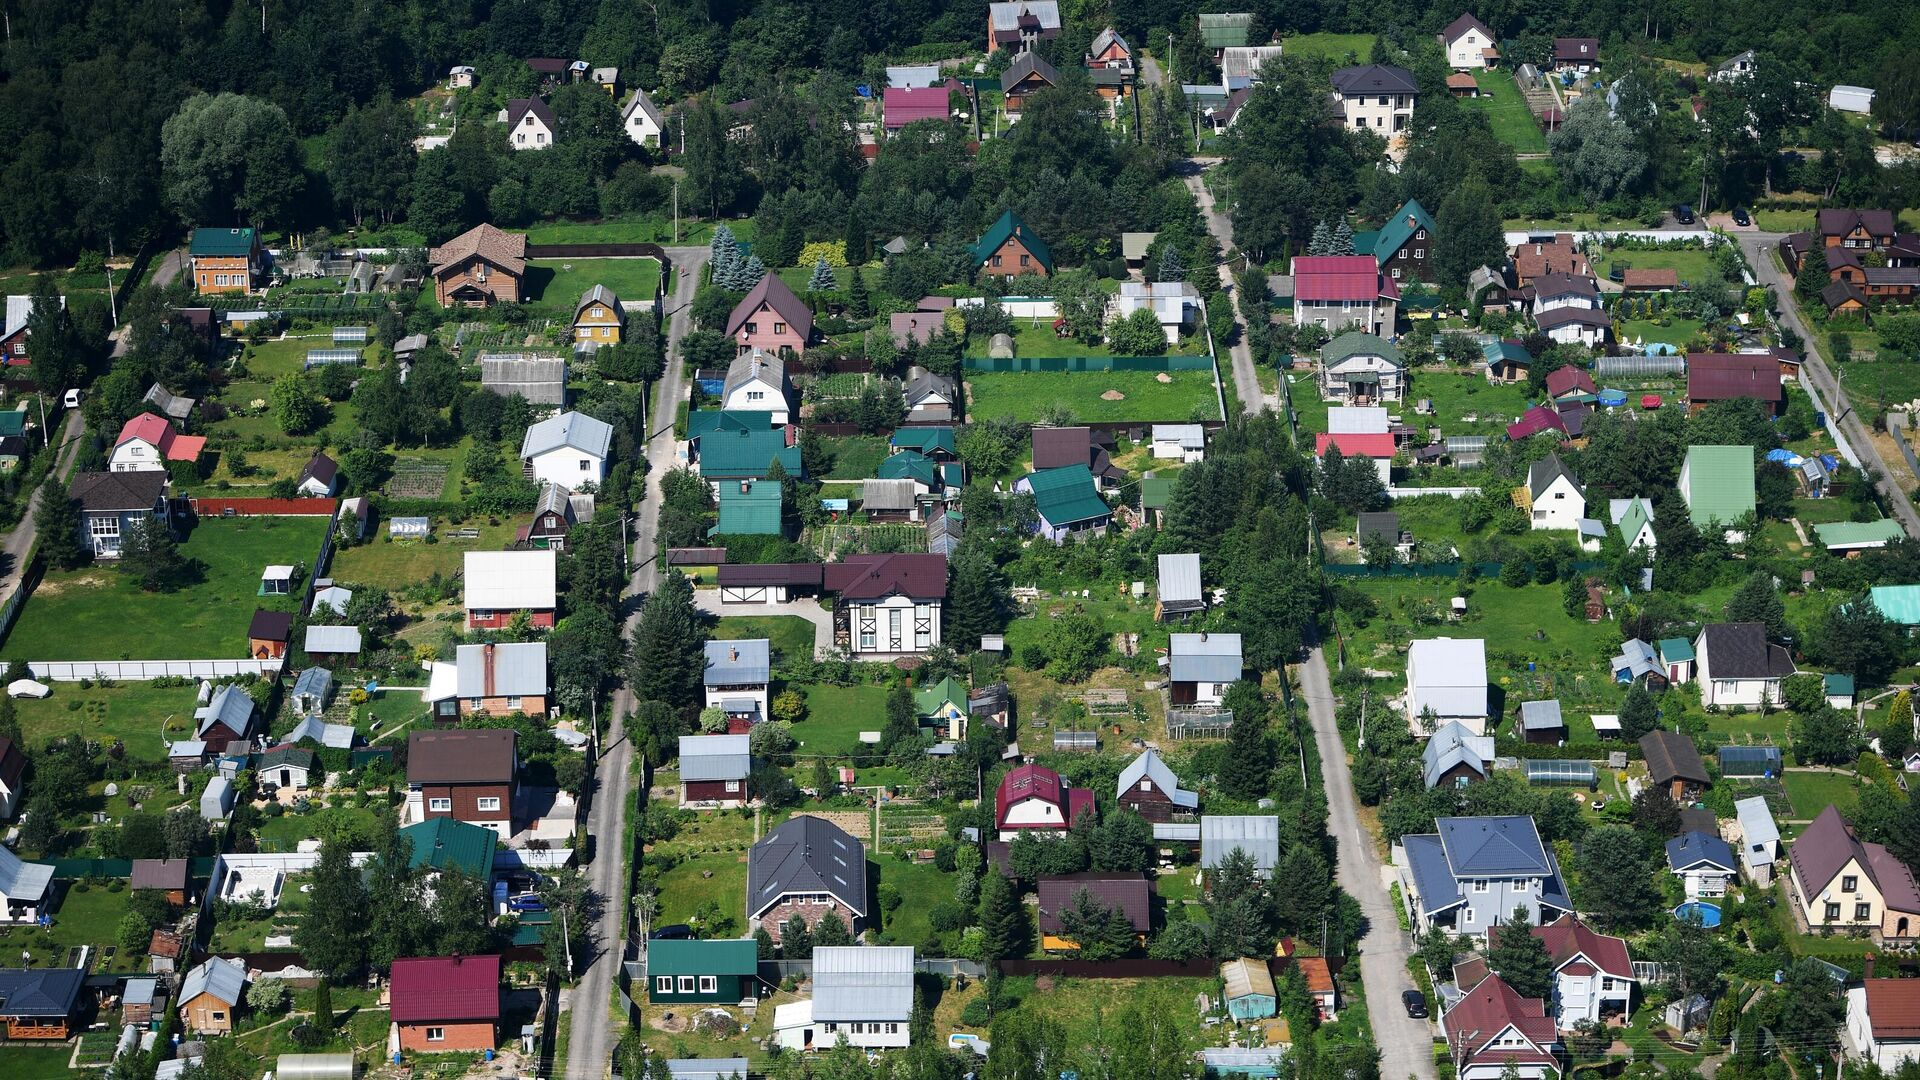 Вид на дома в садовом товариществе - РИА Новости, 1920, 07.09.2021